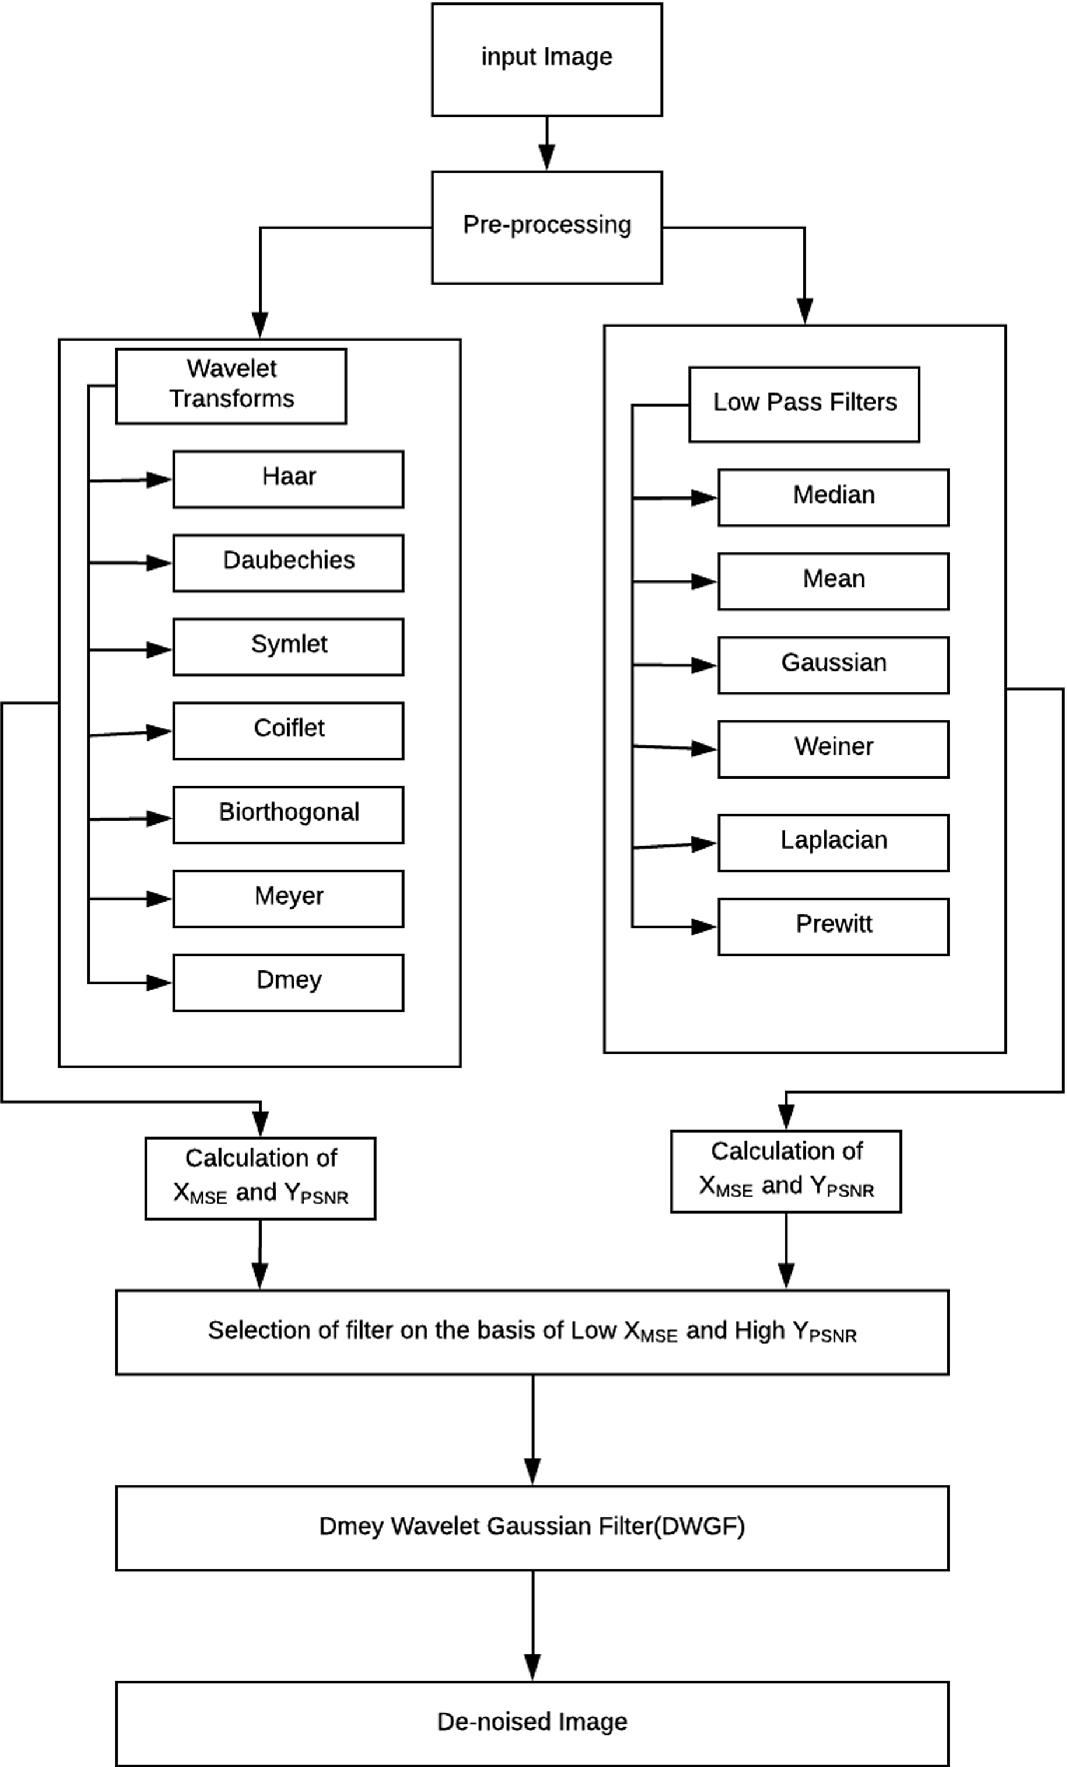 Design of Dmey Wavelet Gaussian Filter (DWGF) for De-noising